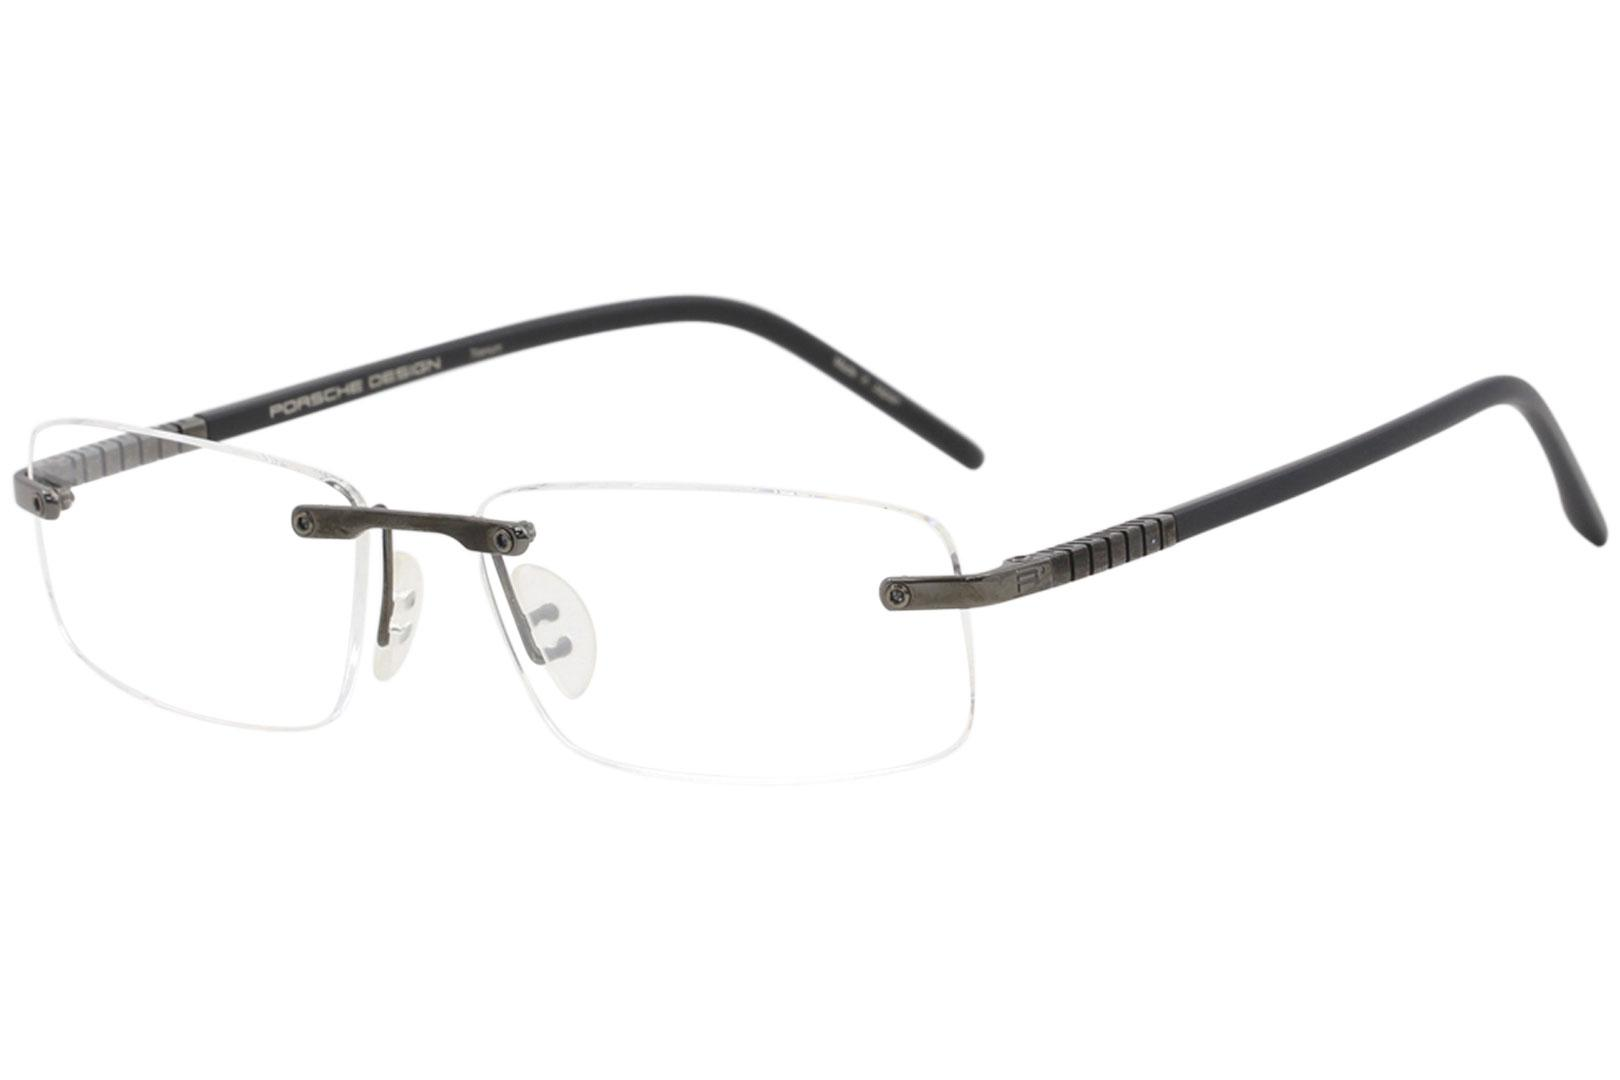 50a34ca248 Porsche Design Men s Eyeglasses P8144 P 8144 Rimless Titanium Optical Frame  by Porsche Design